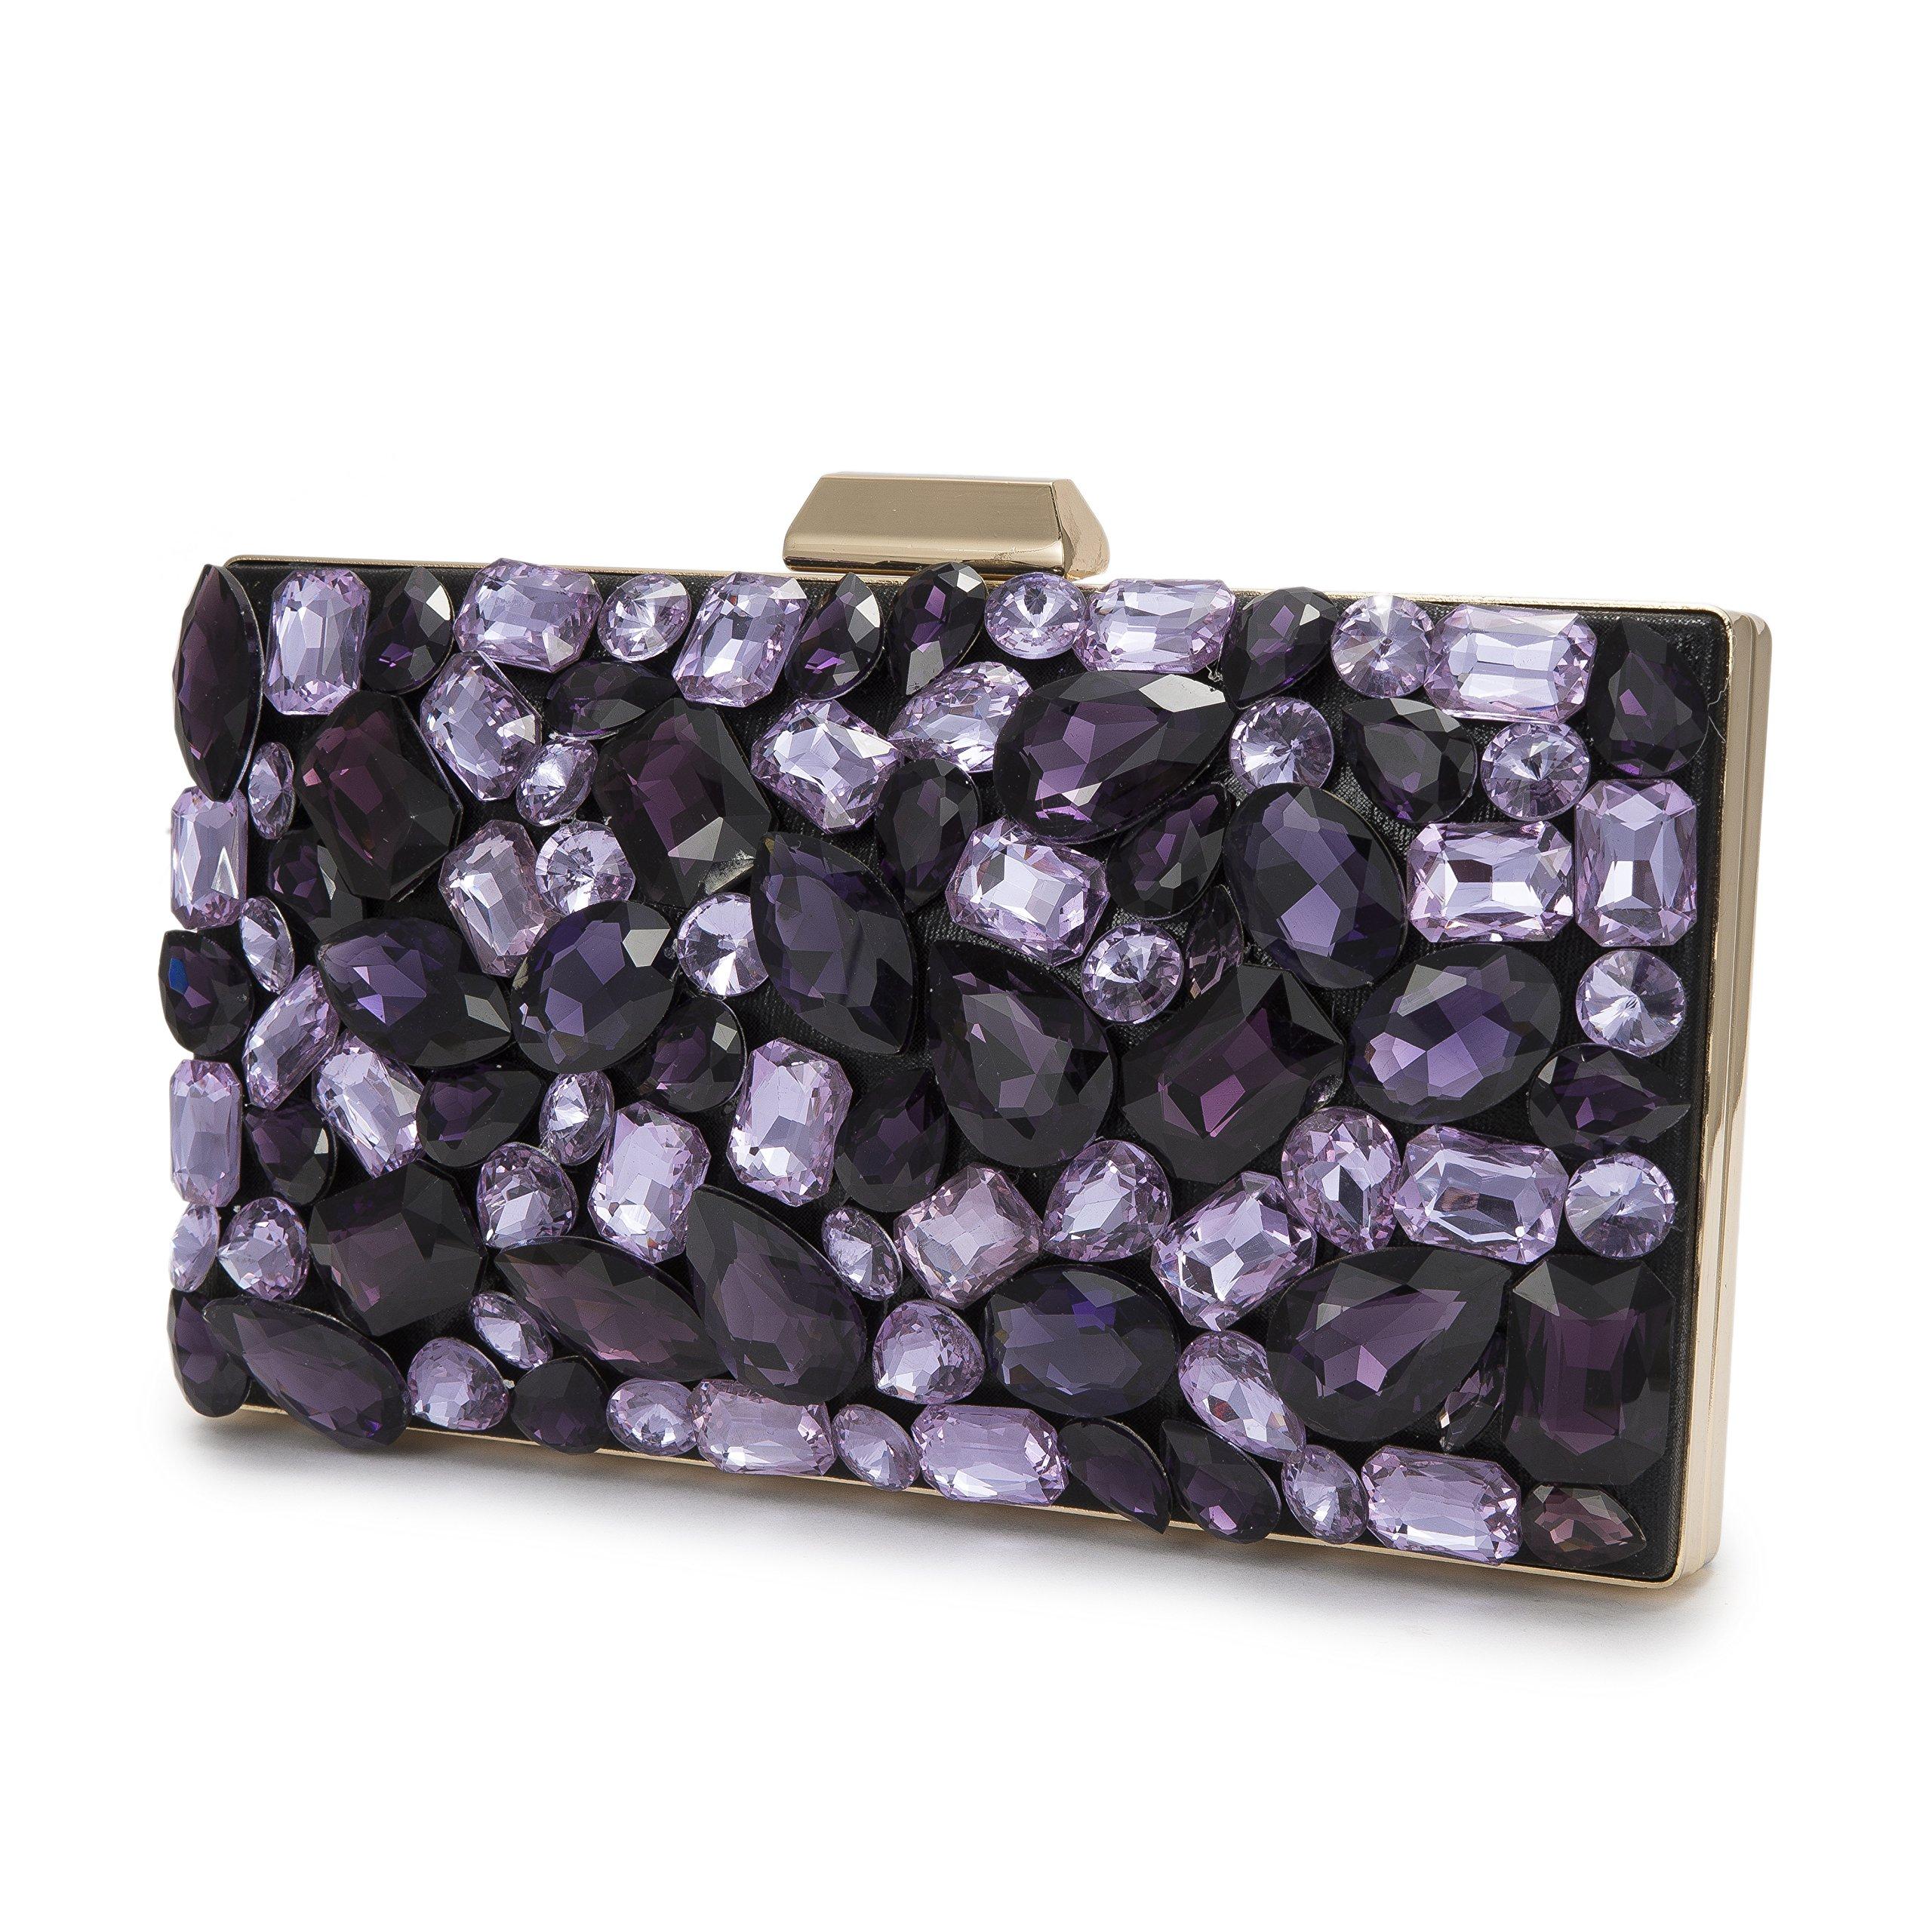 Evening Bag Clutch Beads Black women Crystal purple Rhinestone bag evening handbags clutches for women